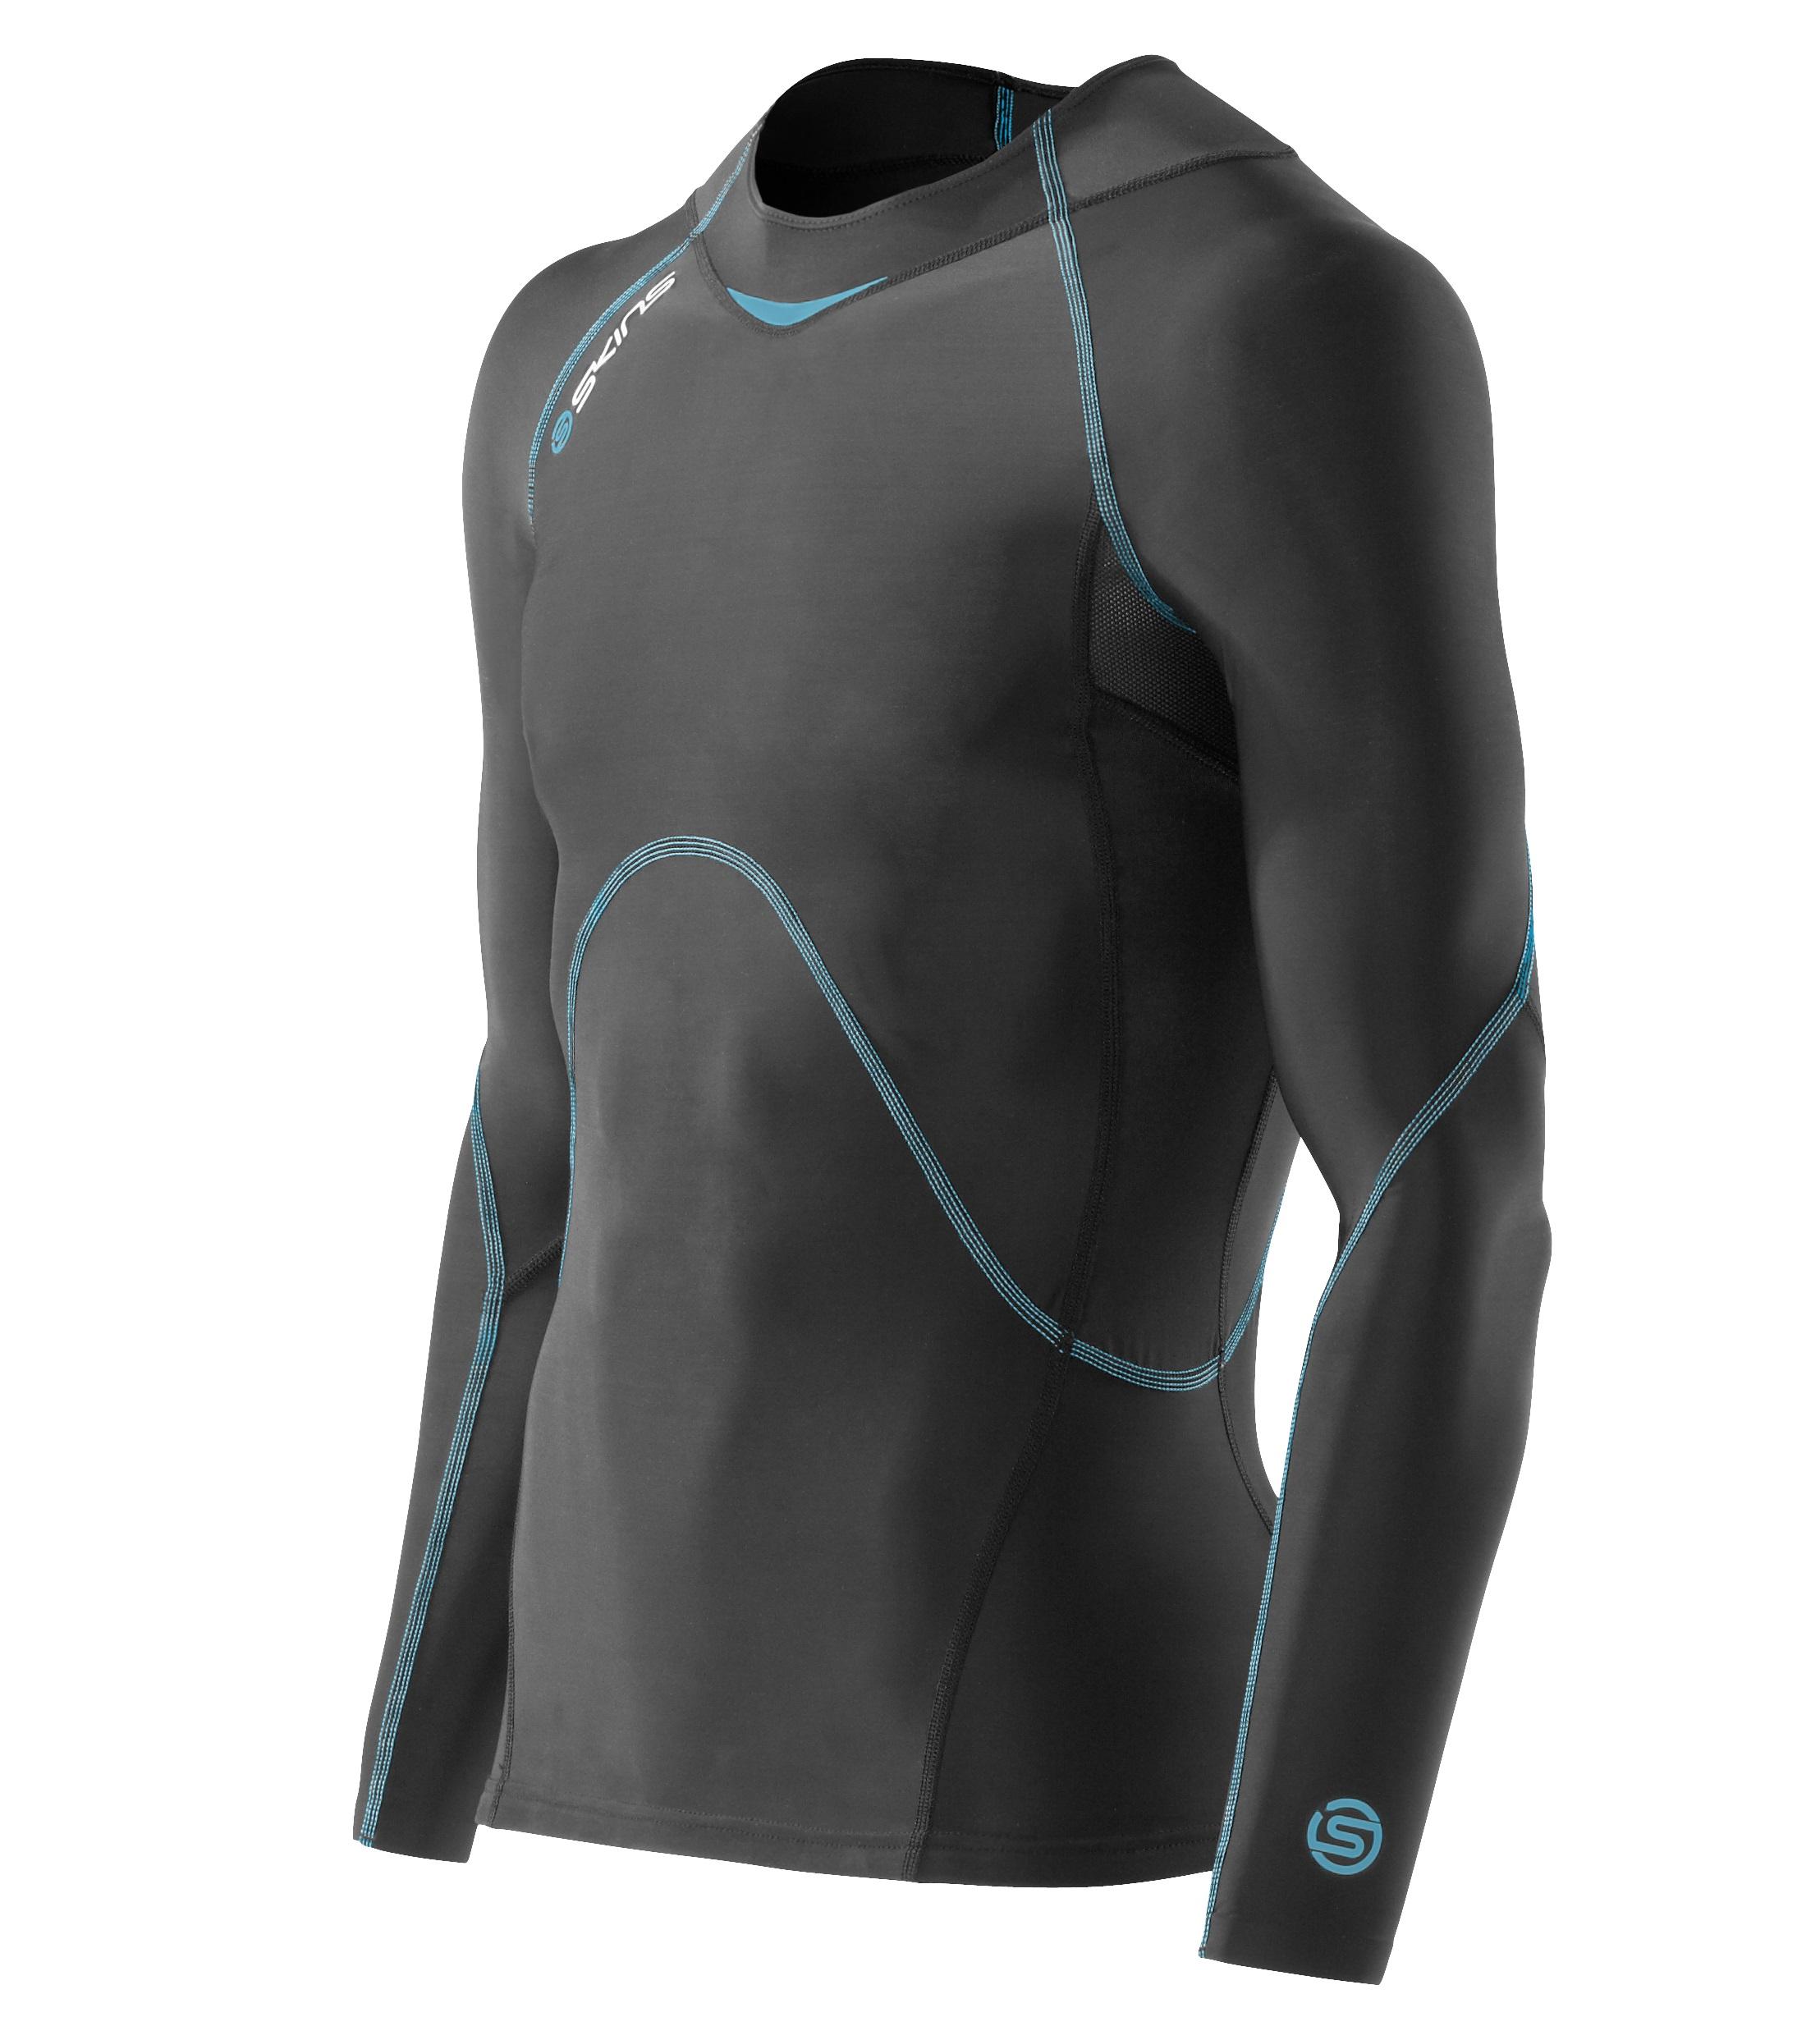 Bio Coldblack Top Long Sleeve Noir Et Bleu tee shirt de compression